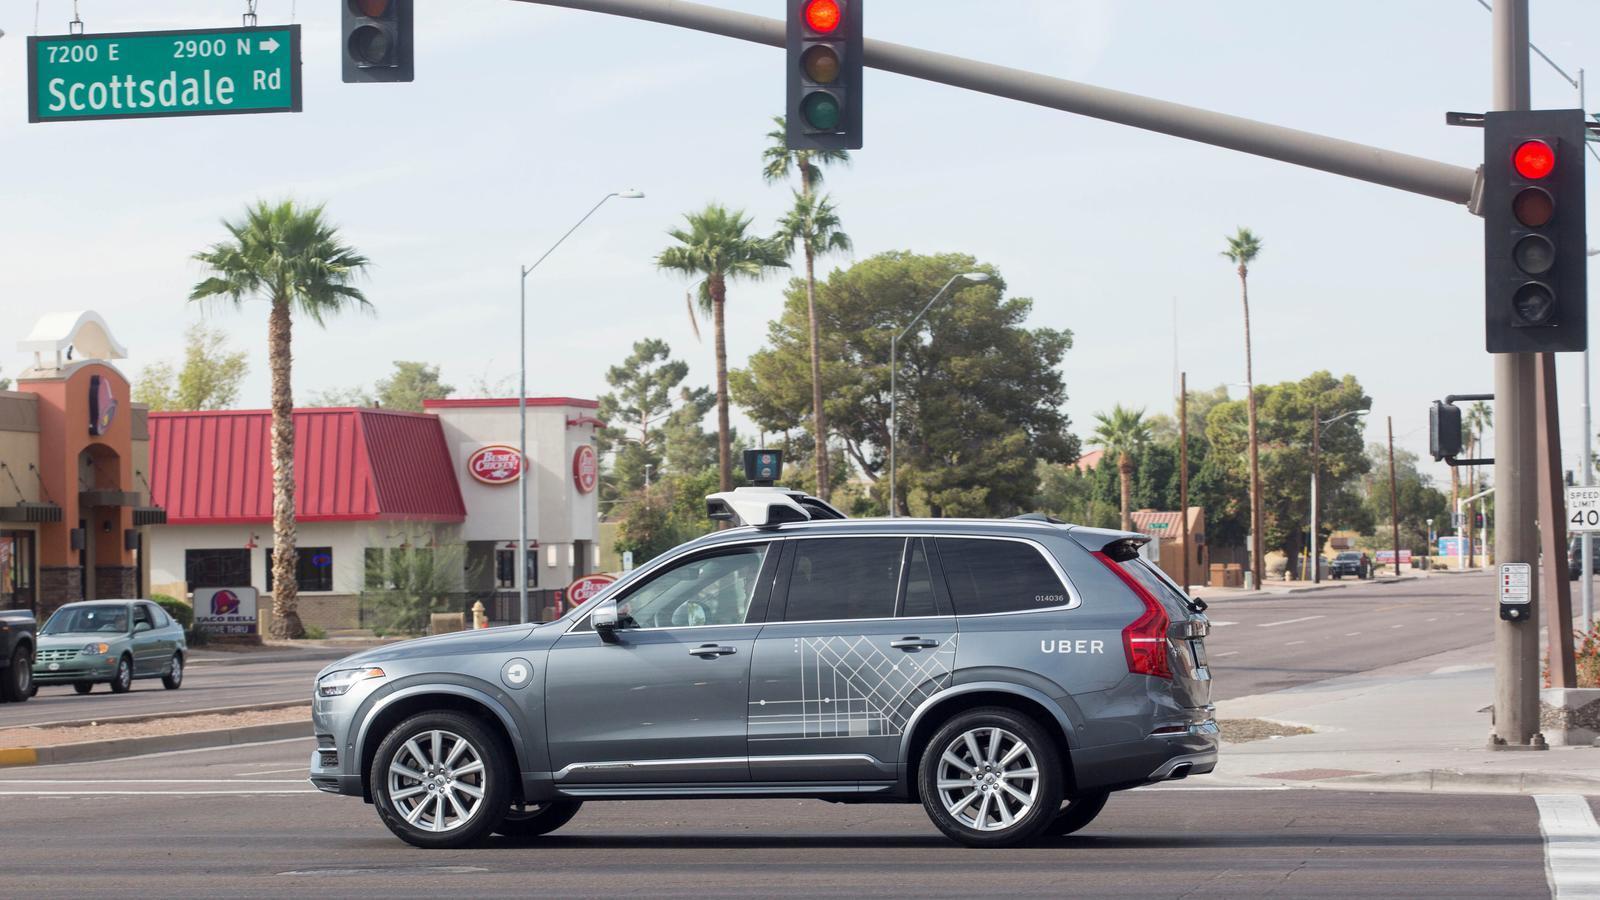 Un vehicle autònom d'Uber en un carrer d'Arizona